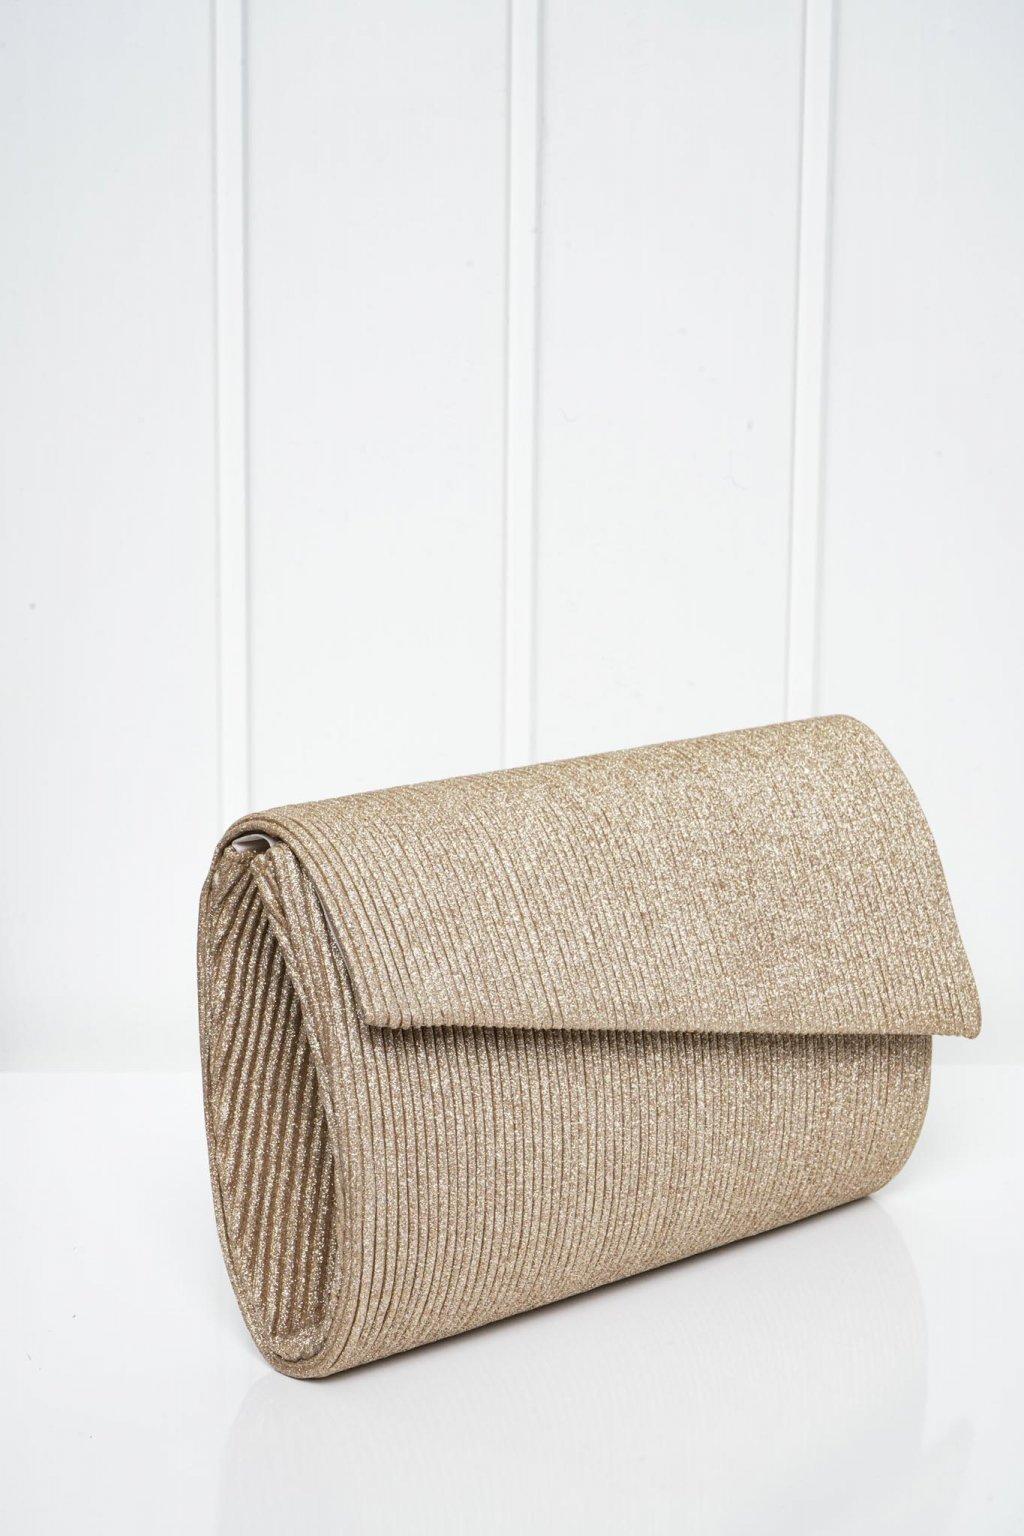 Kabelka, crossbody, ruksak, shopping bag, shopperka, 516